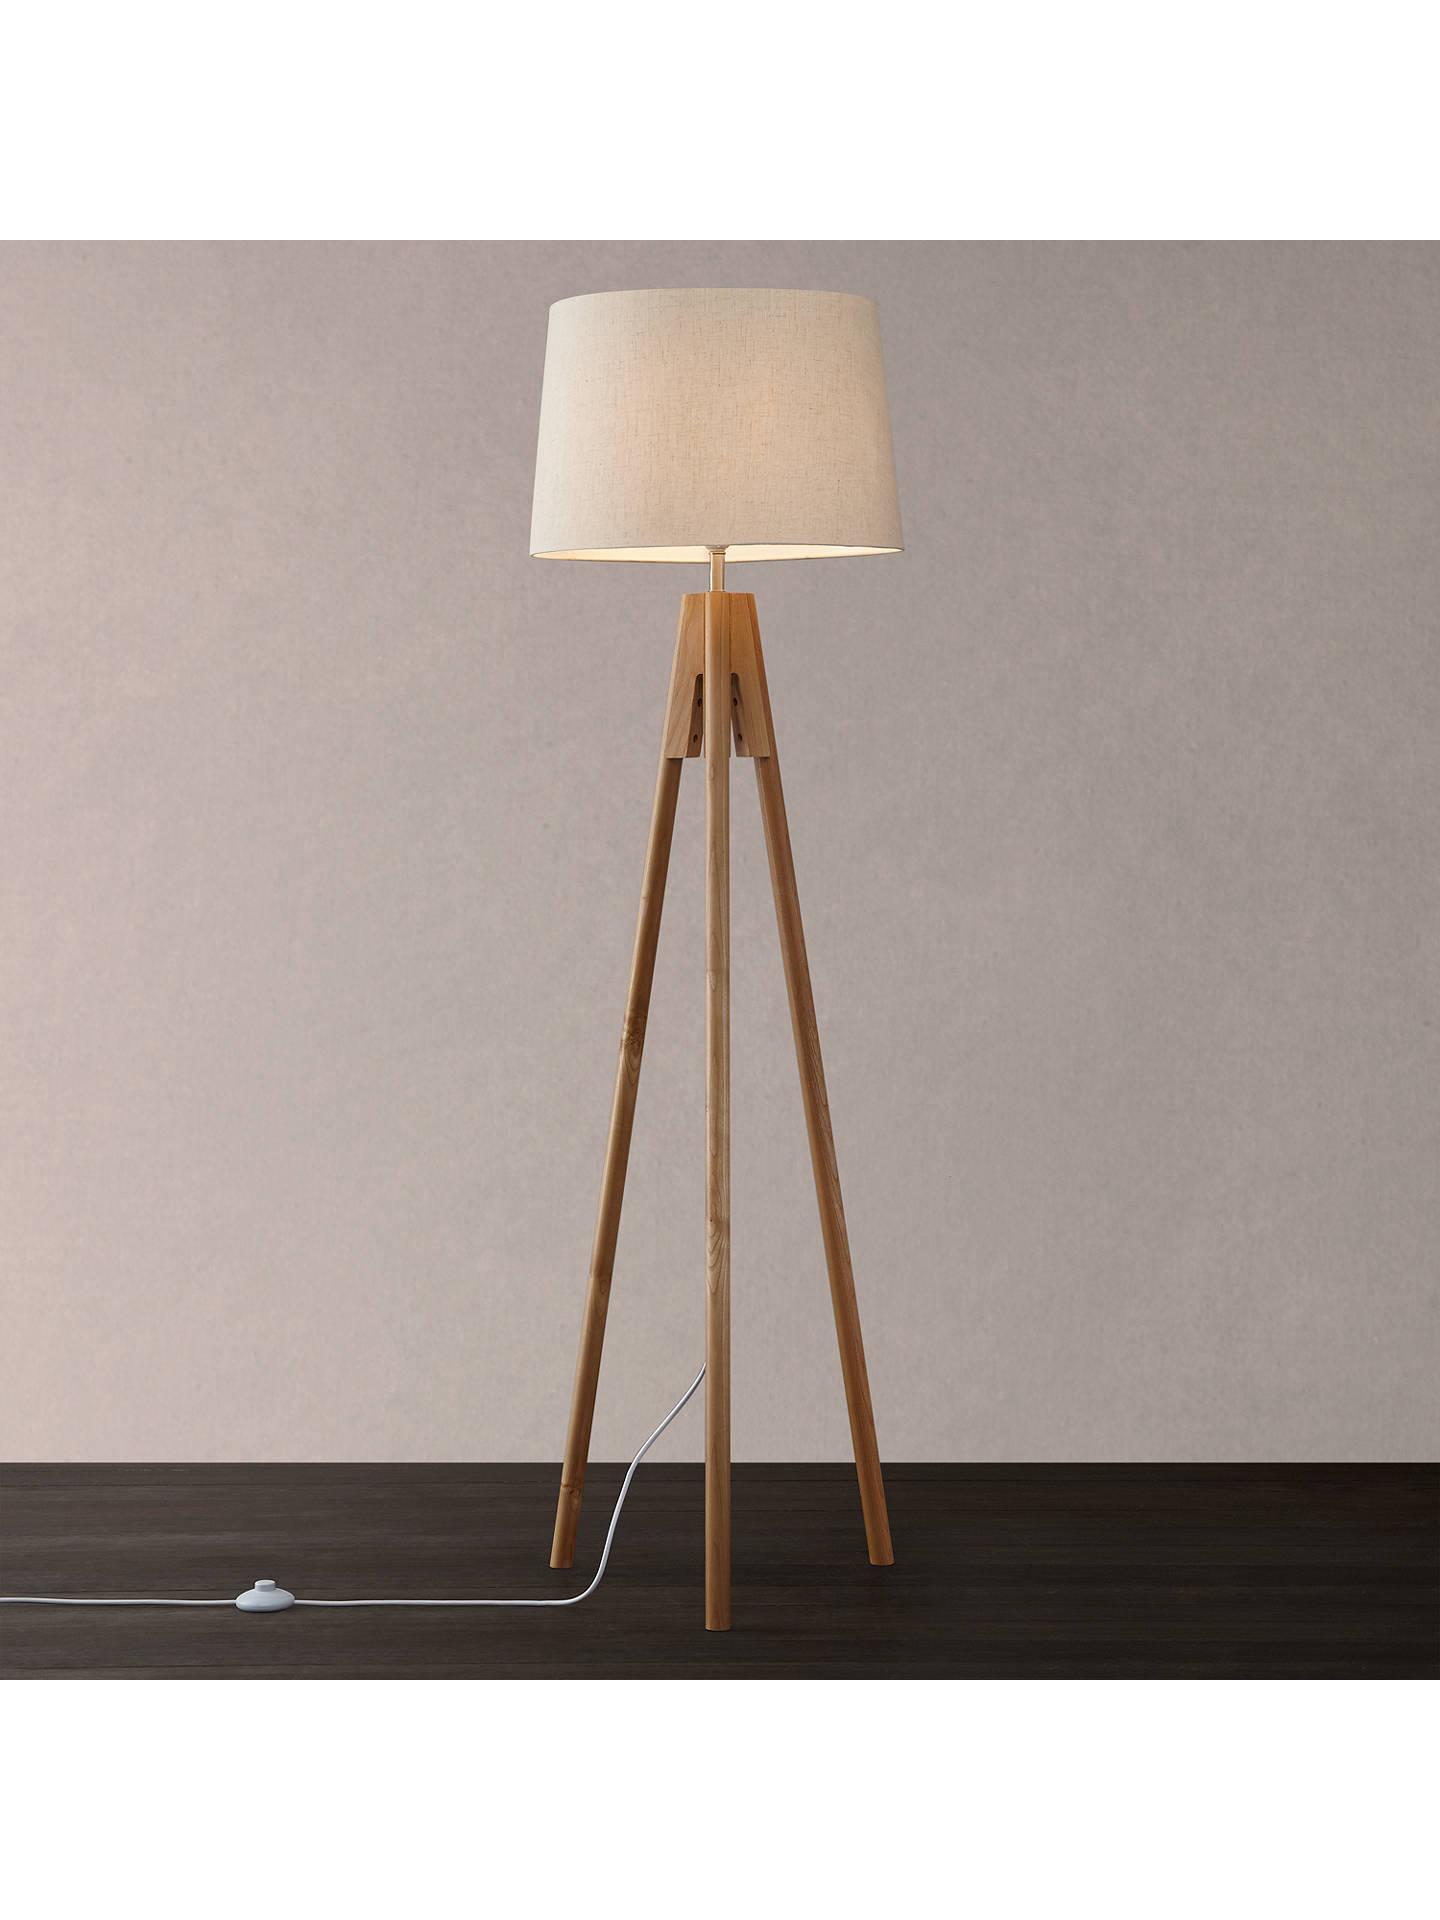 John Lewis & Partners Hampstead Wooden Tripod Floor Lamp